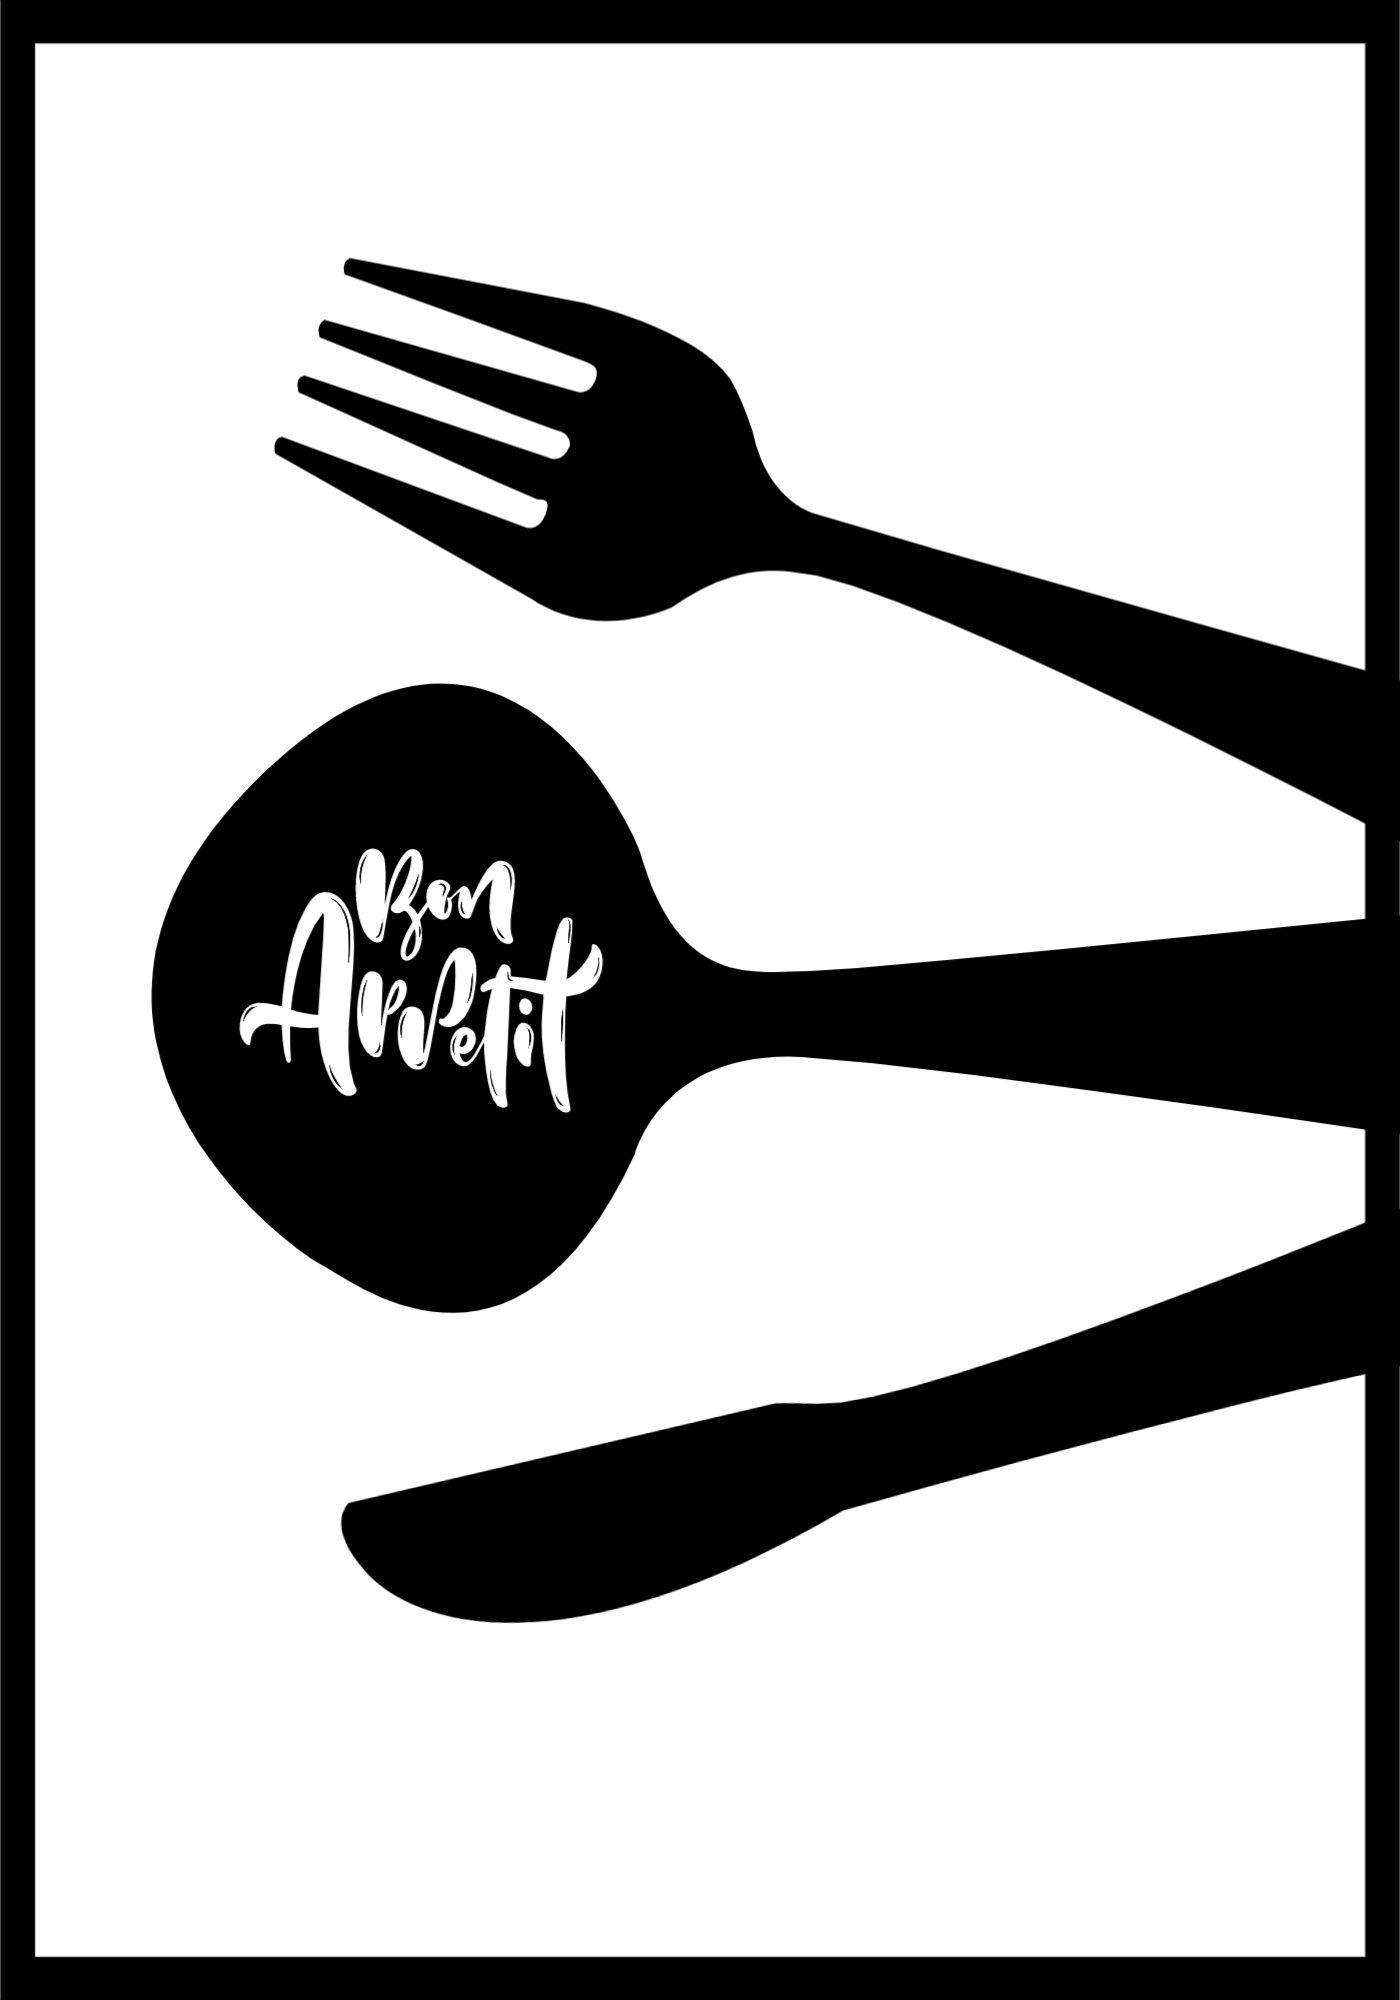 Kitchen Poster Design Template